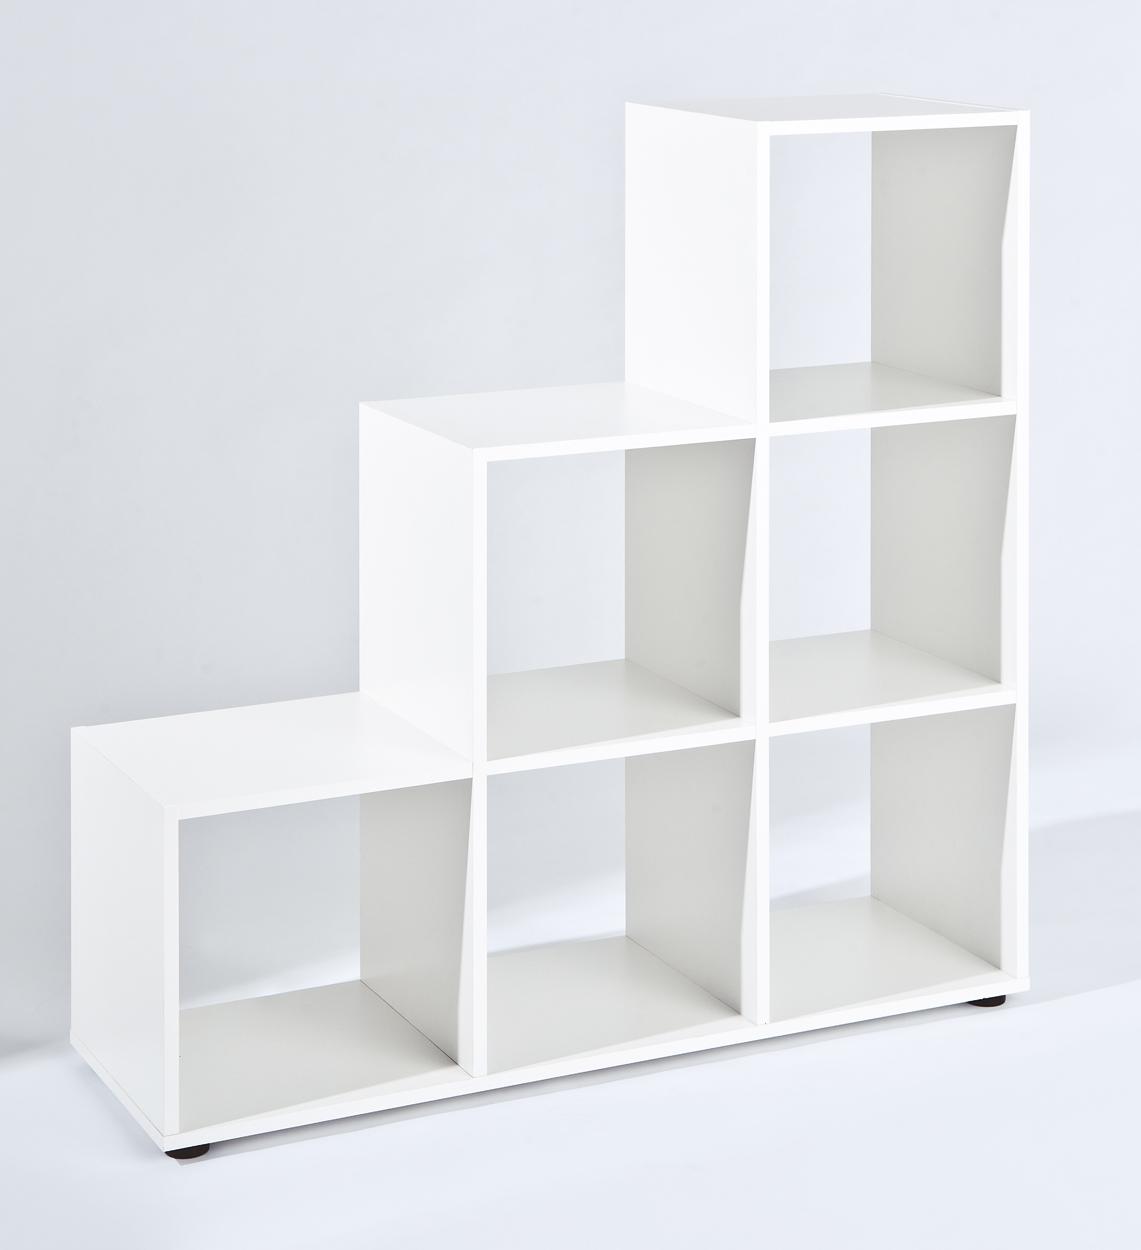 Raumteiler Regal Trennwand Etagere Cadore6 Weiß